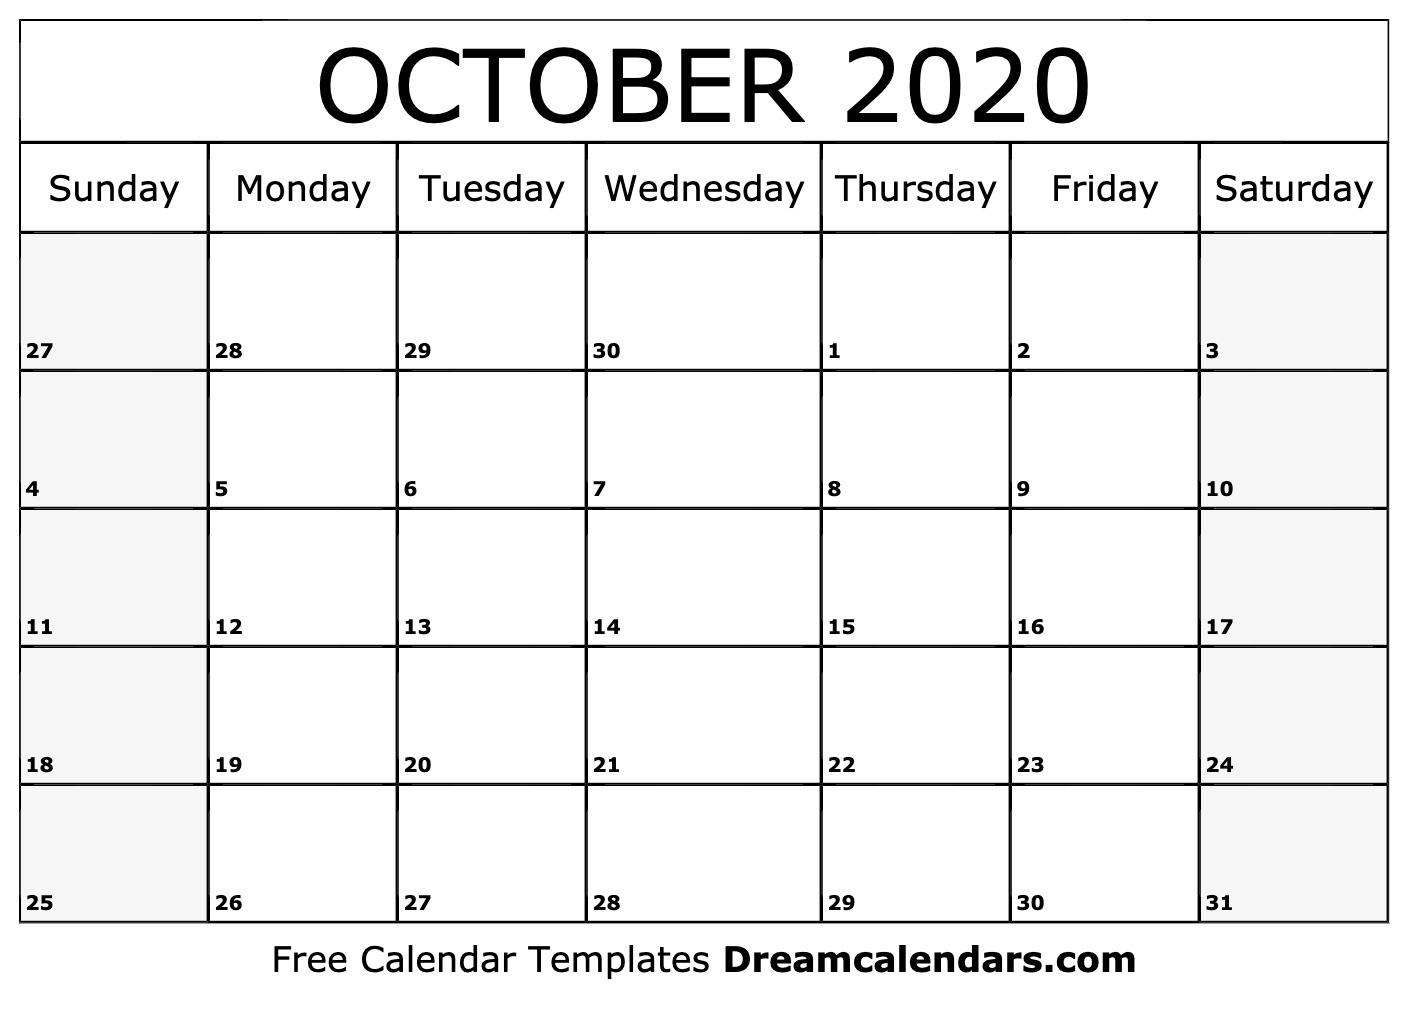 Printable October 2020 Calendar-Blank Calendar October 2020 Printable